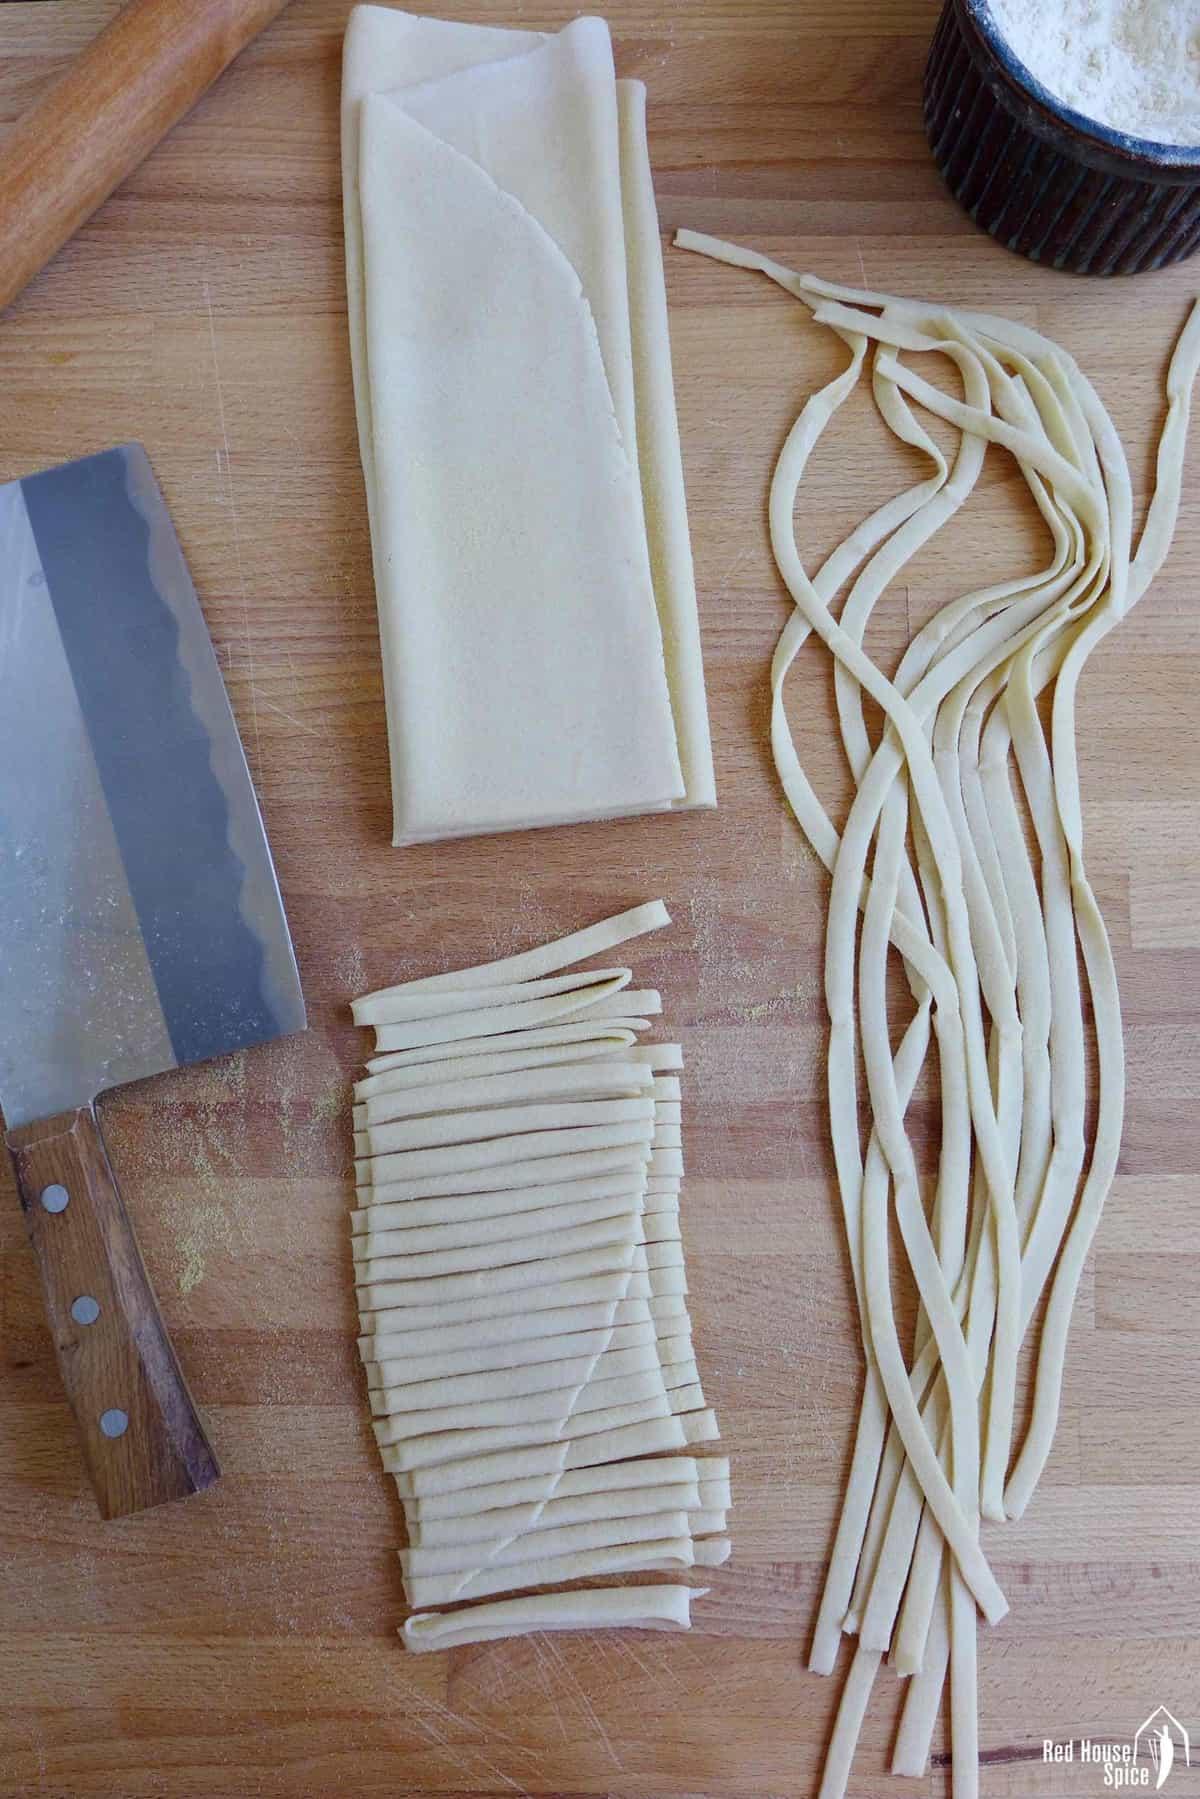 dough sheet and knife cut noodles